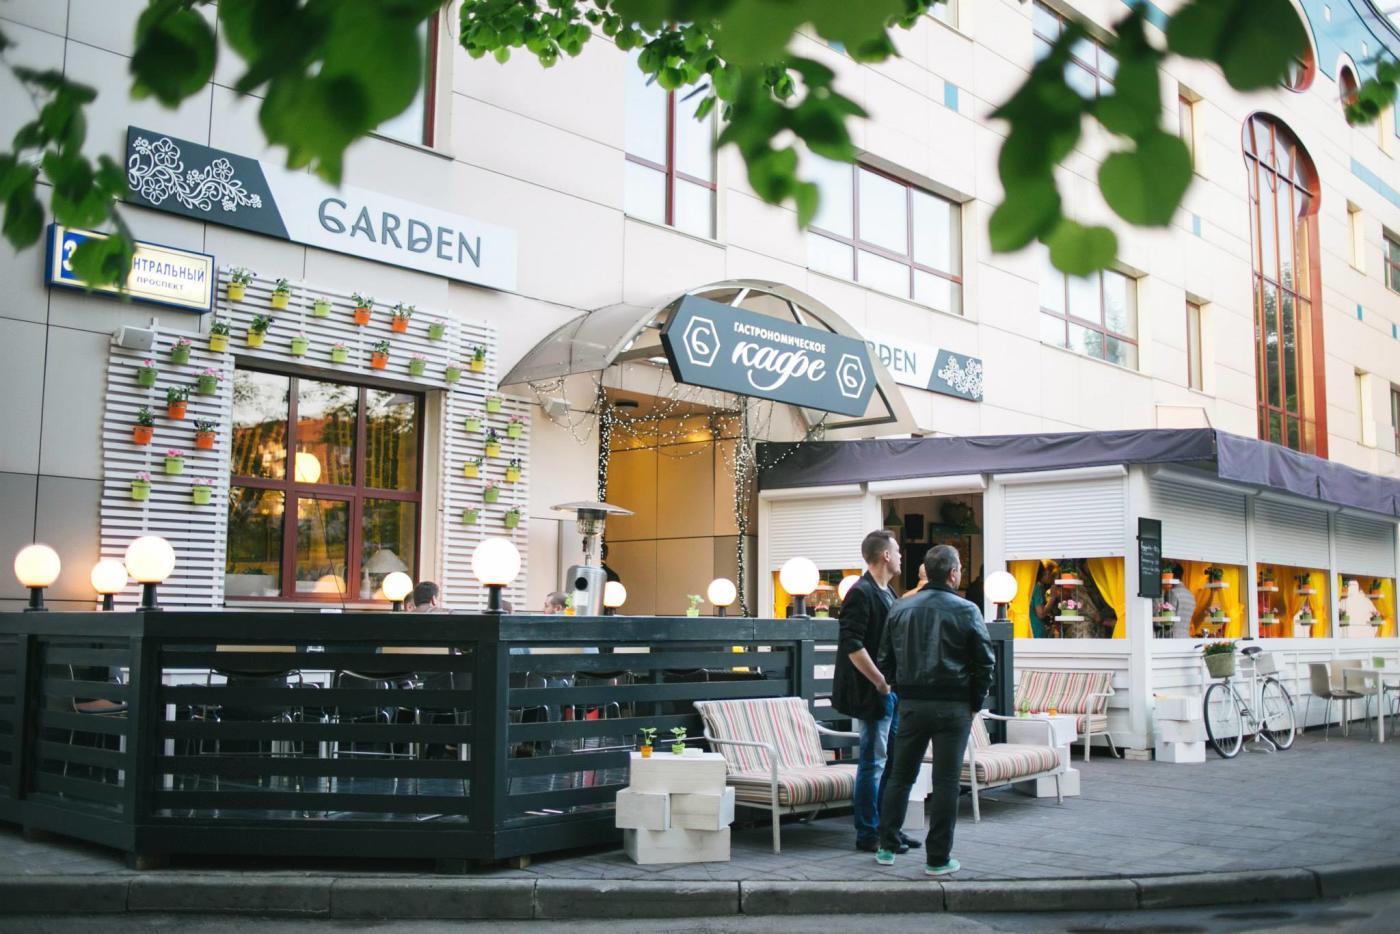 Кафе Гарден в Зеленограде (Garden) фото 47